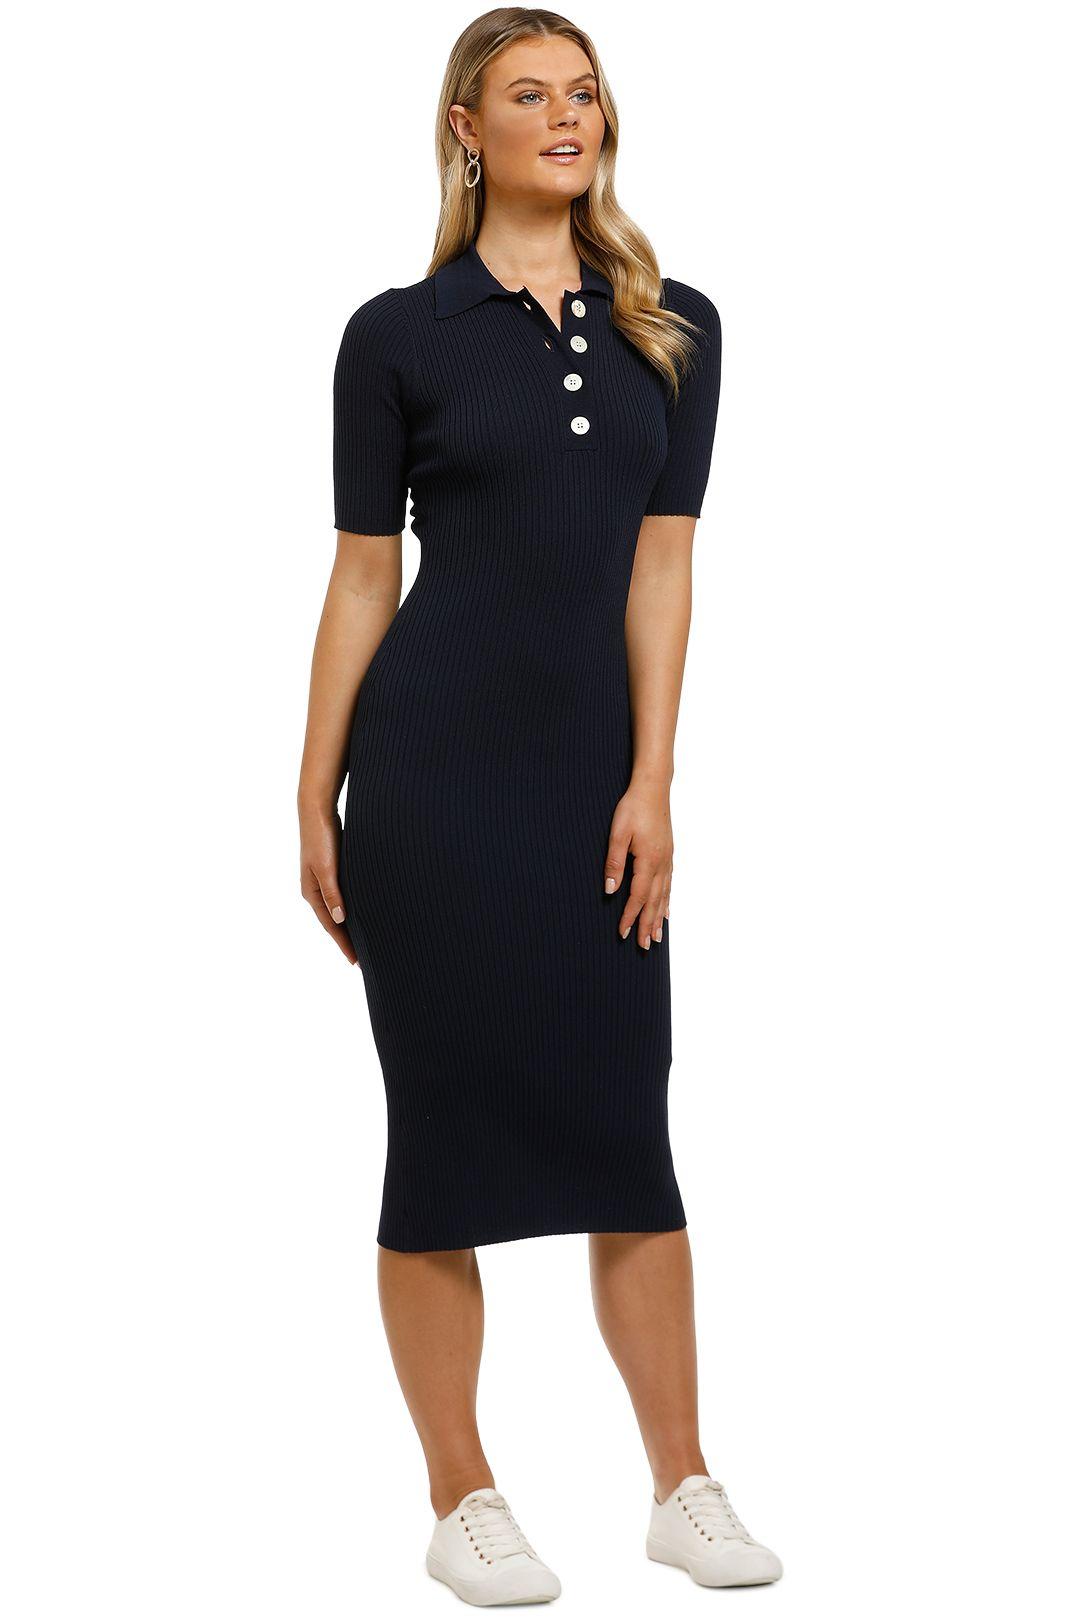 Nobody-Denim-Chelsea-Dress-Navy-Side